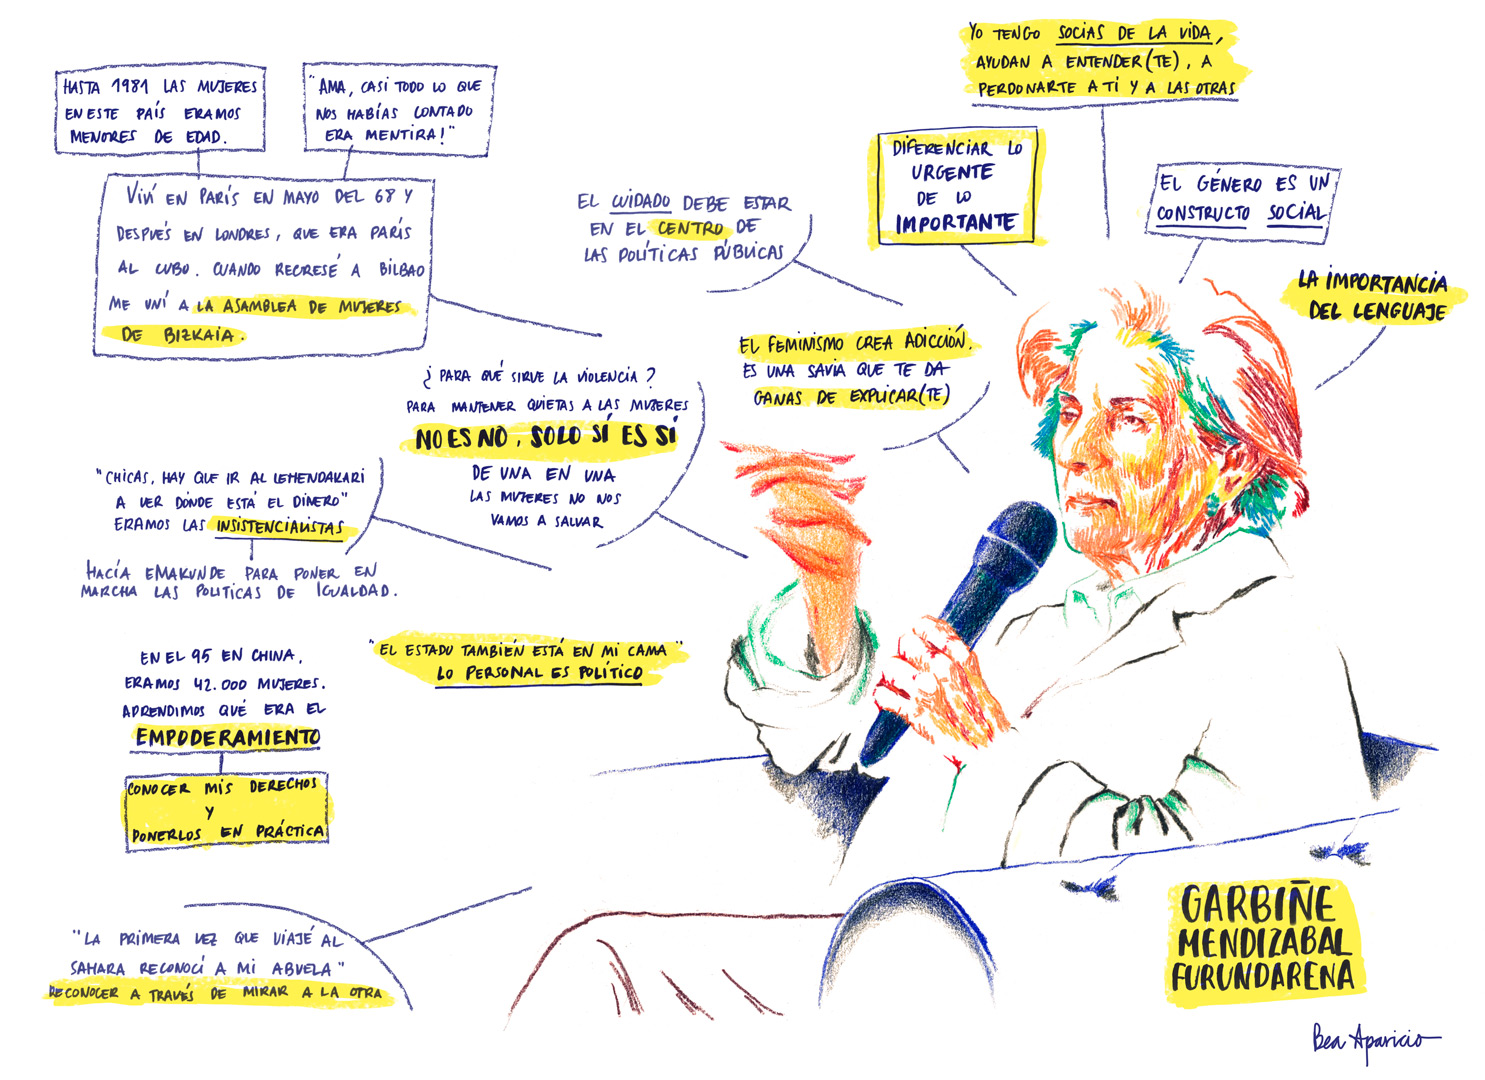 bea_aparicio_garbine-mendizabal_relato-grafico